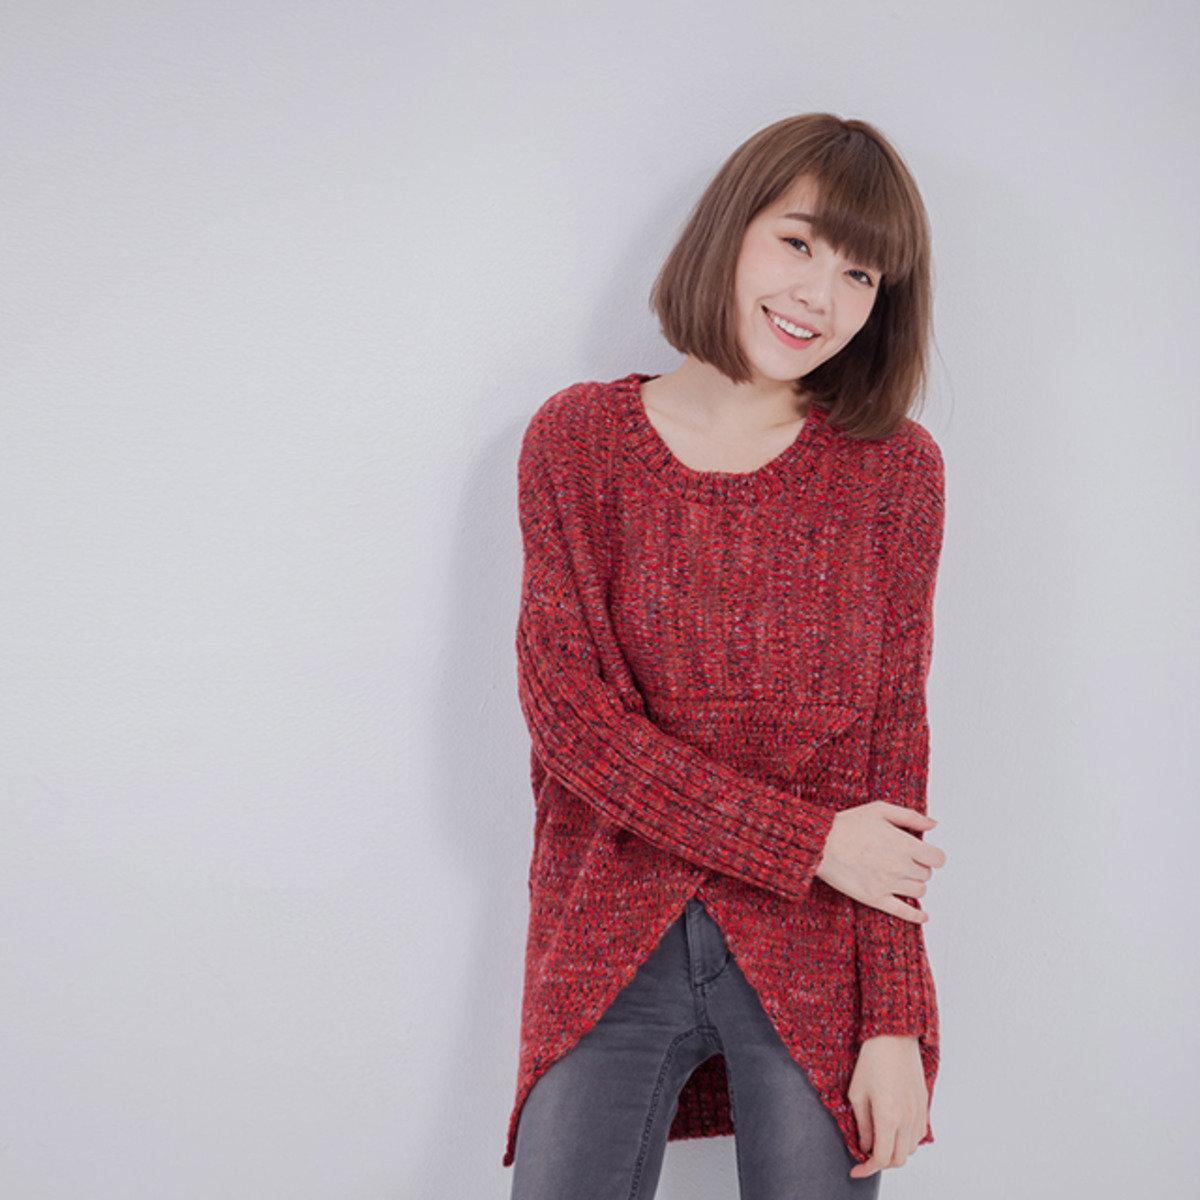 Enid 蛹型針織衫/紅